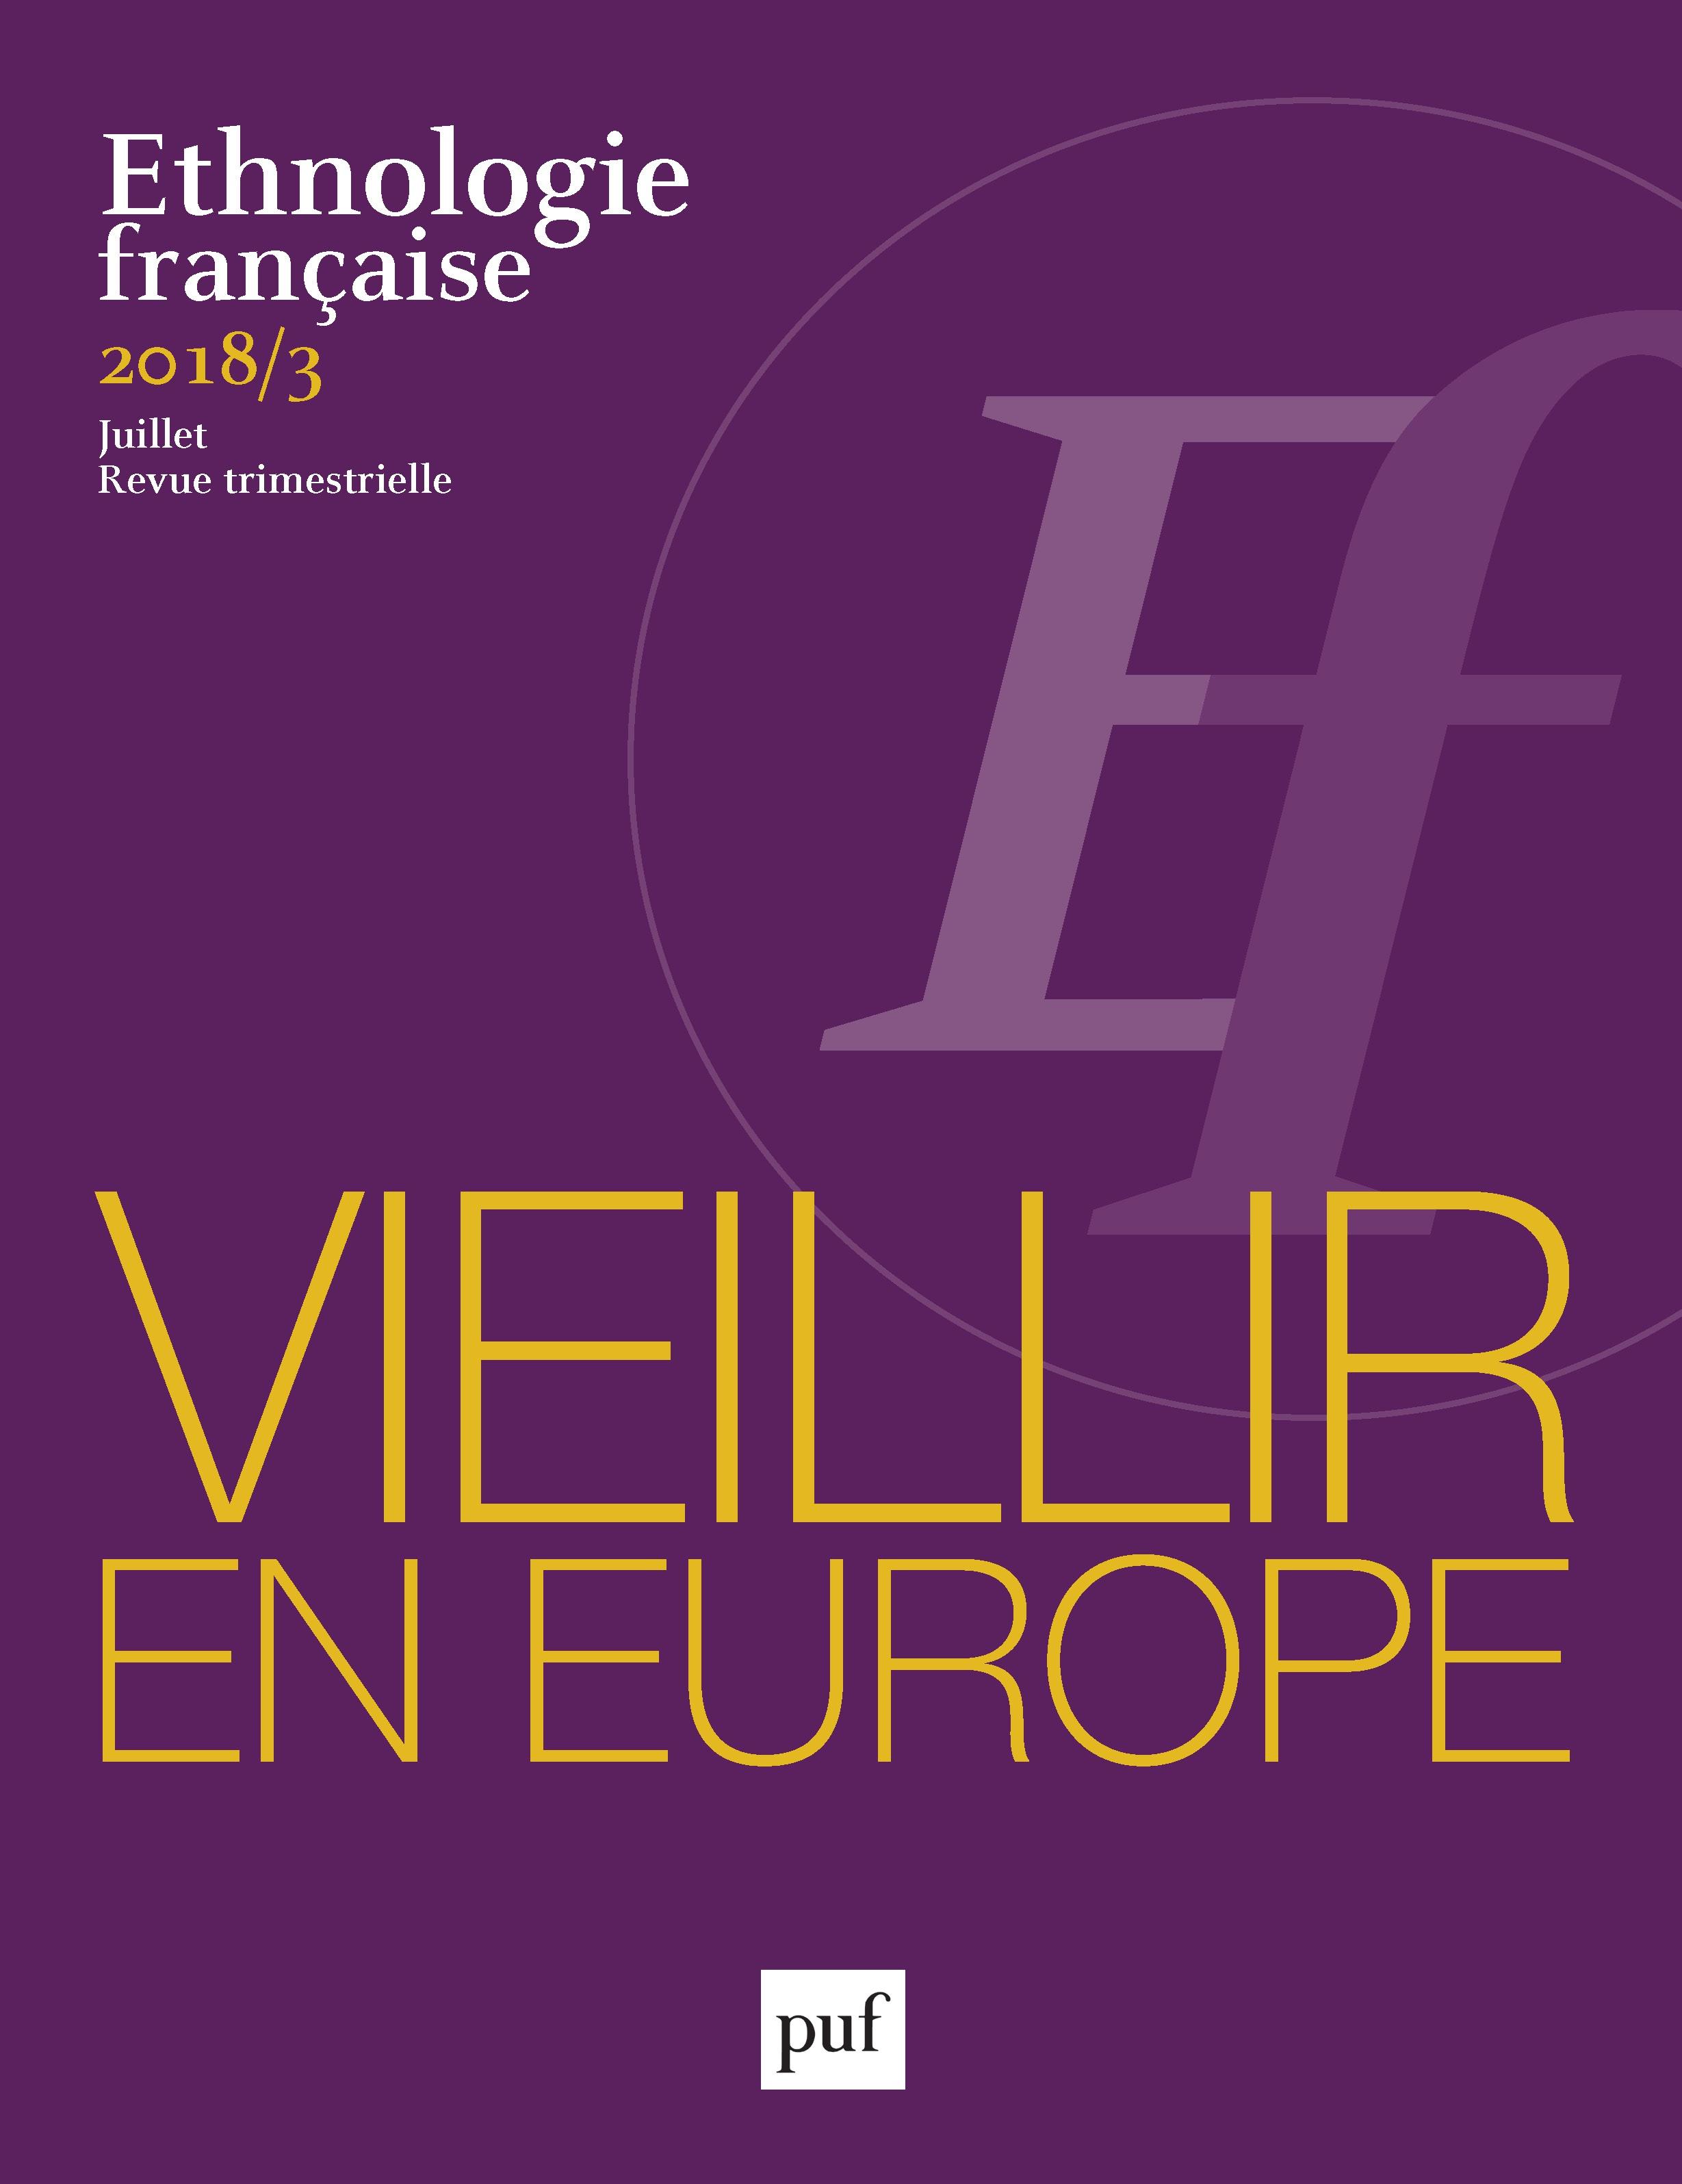 Vieillir en Europe